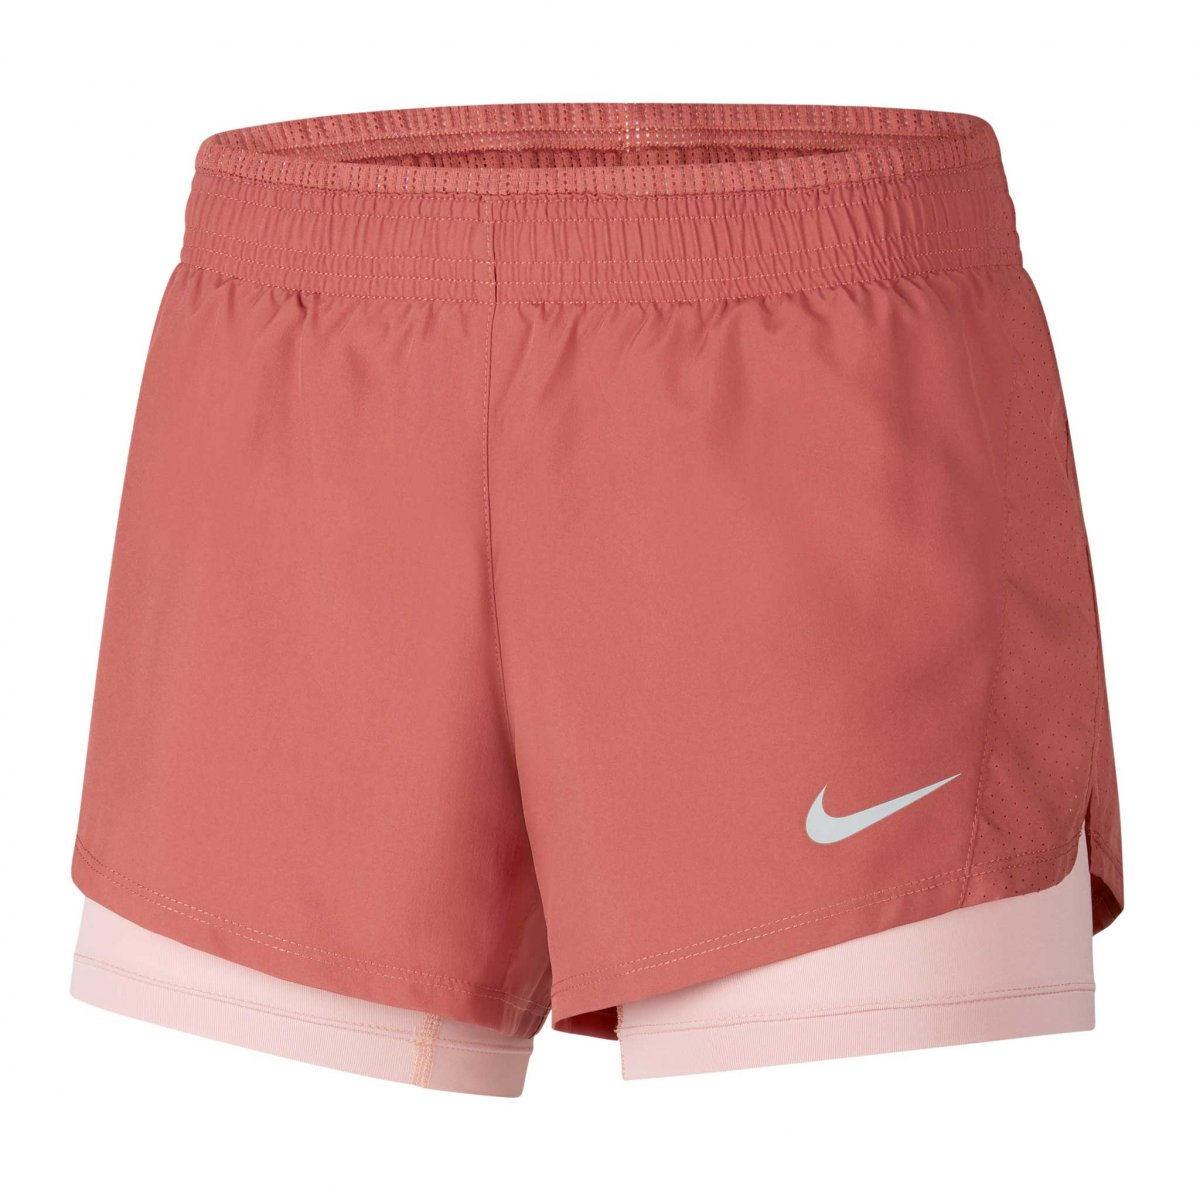 Short Nike 10K 2IN1 Feminino Rosa